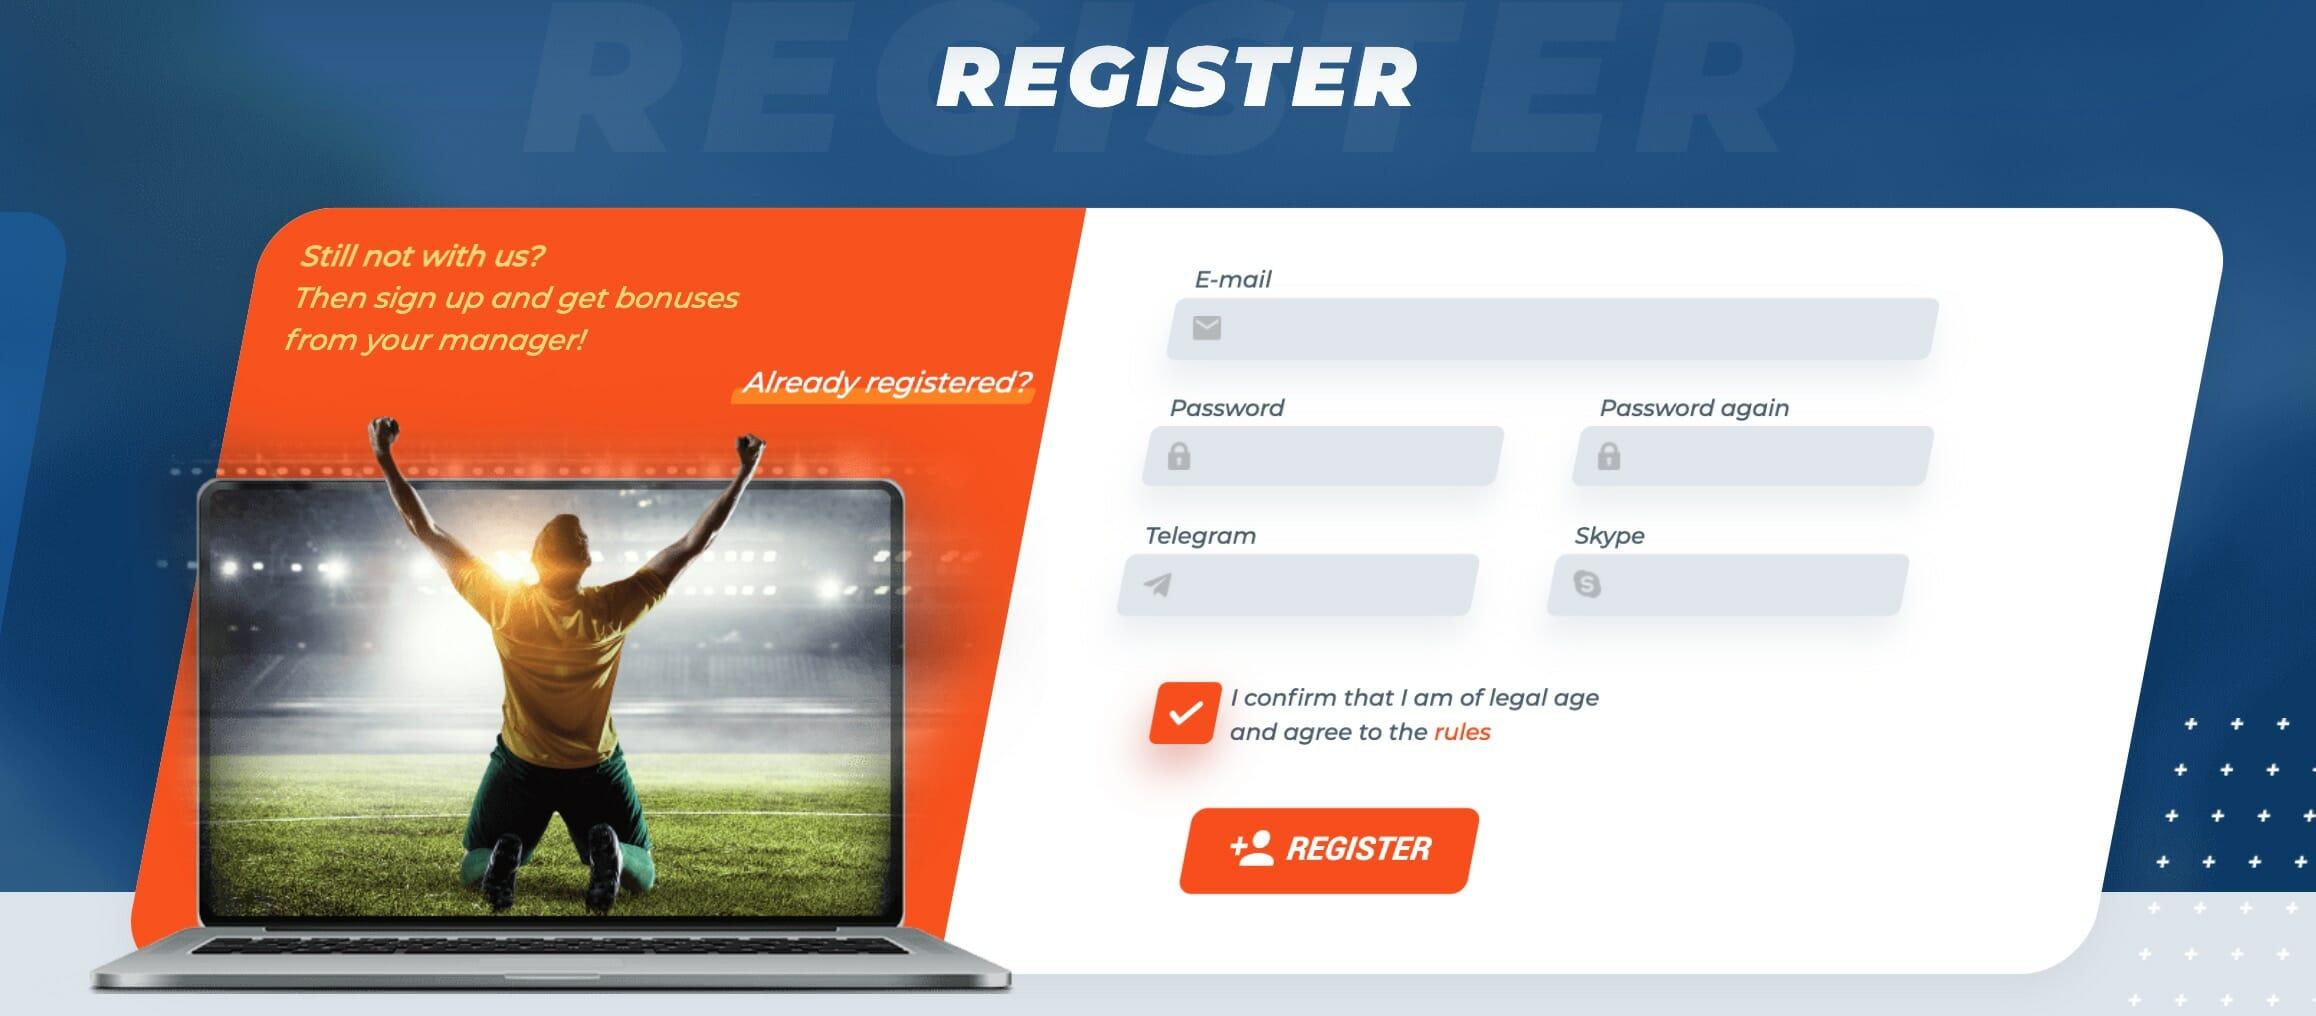 MostBet registeration